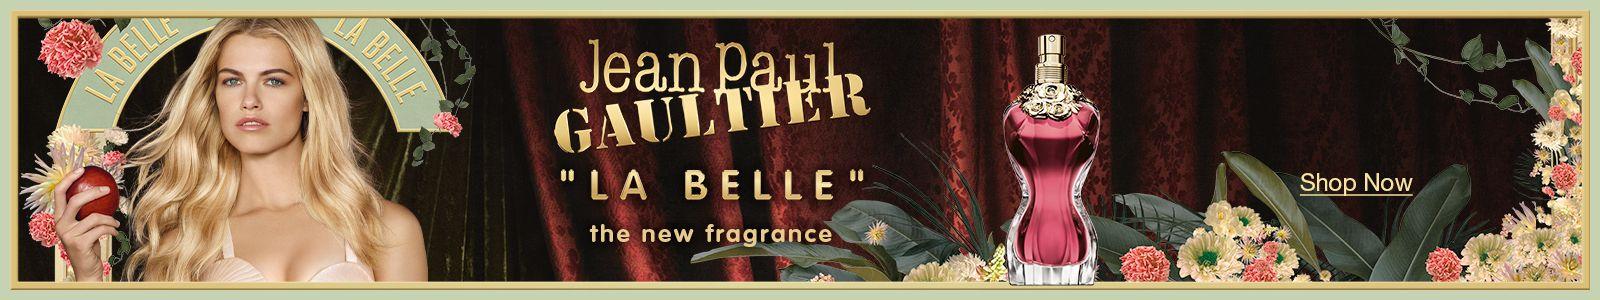 "Jean Paul, Gaultier, "" La Belle"" the new fragrance, Shop Now"